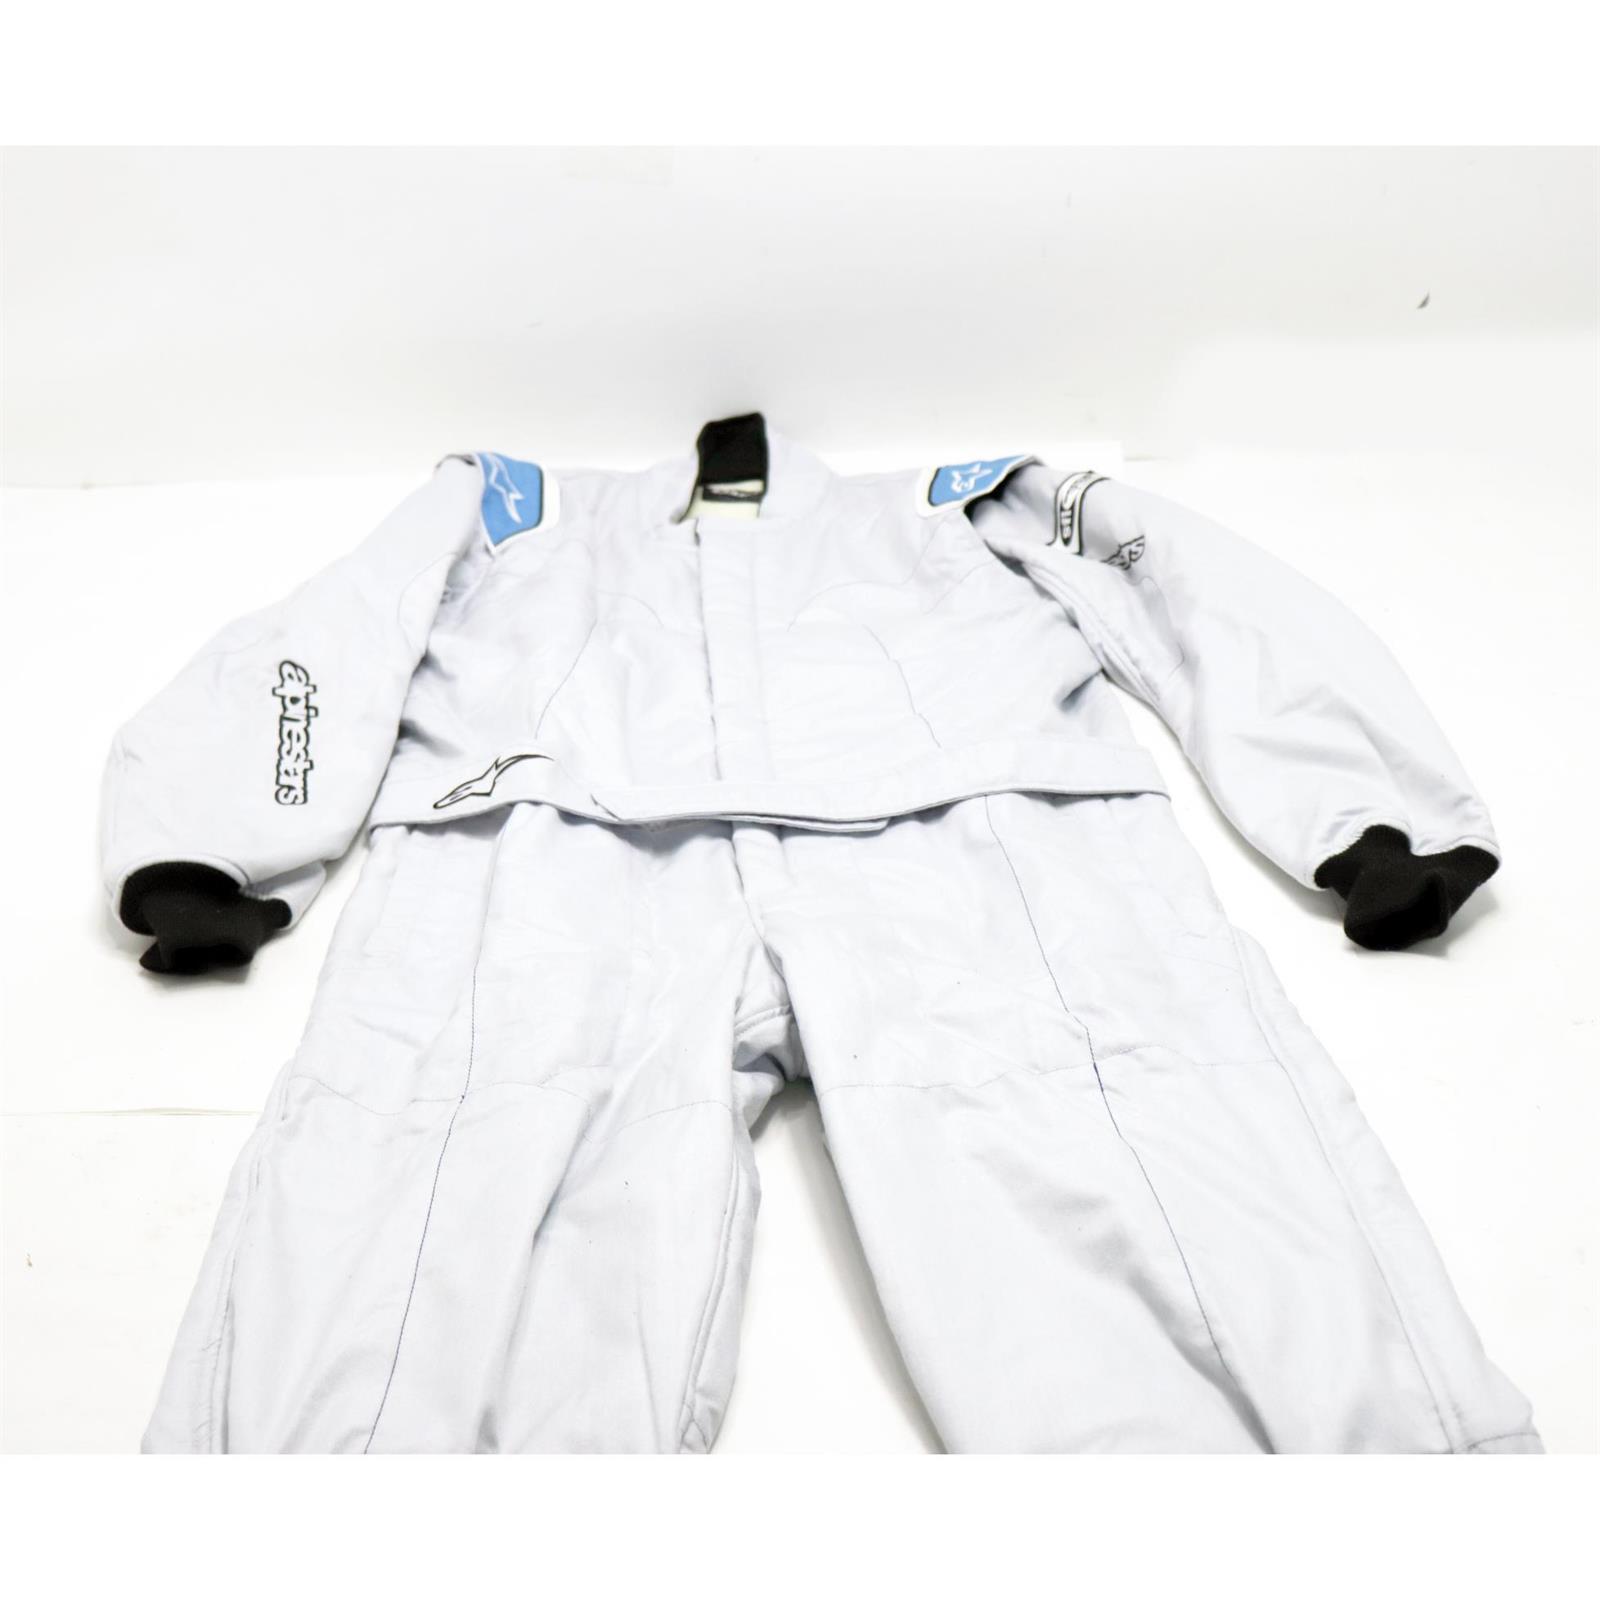 Black, Size 58 Alpinestars KNOXVILLE Suit